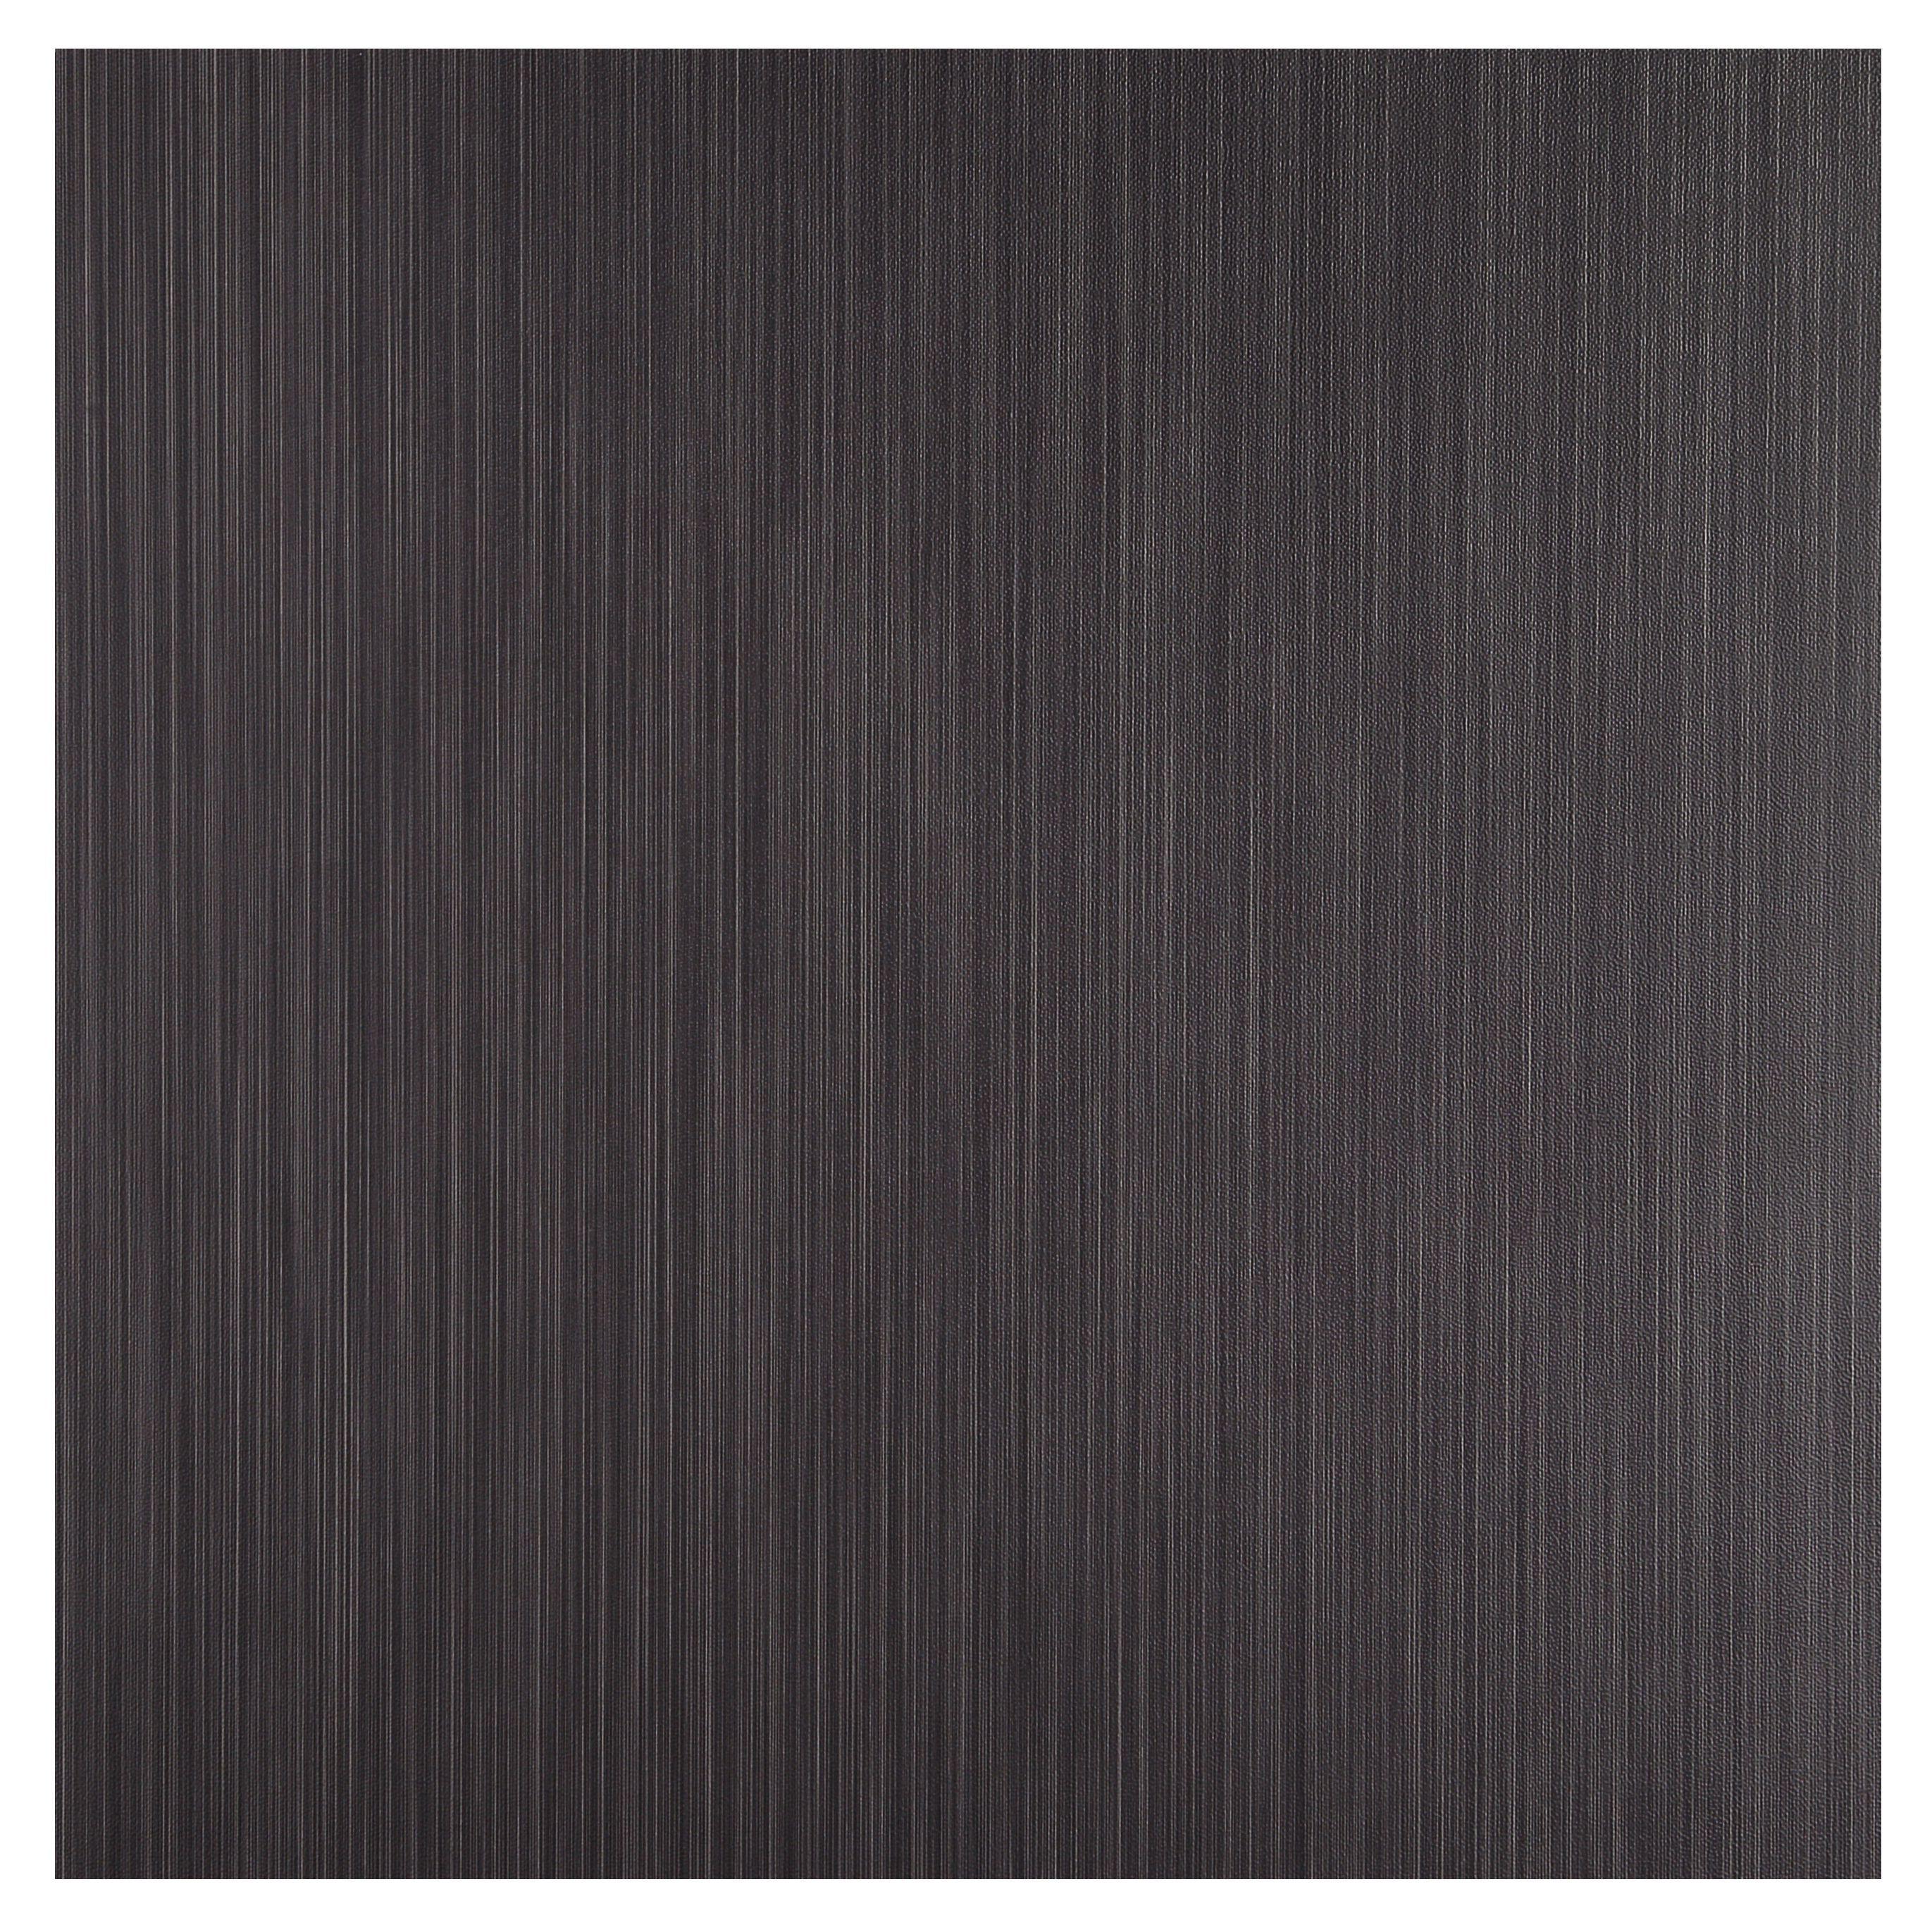 Colours Black Brushed Self Adhesive Vinyl Tile 1.02m² Pack